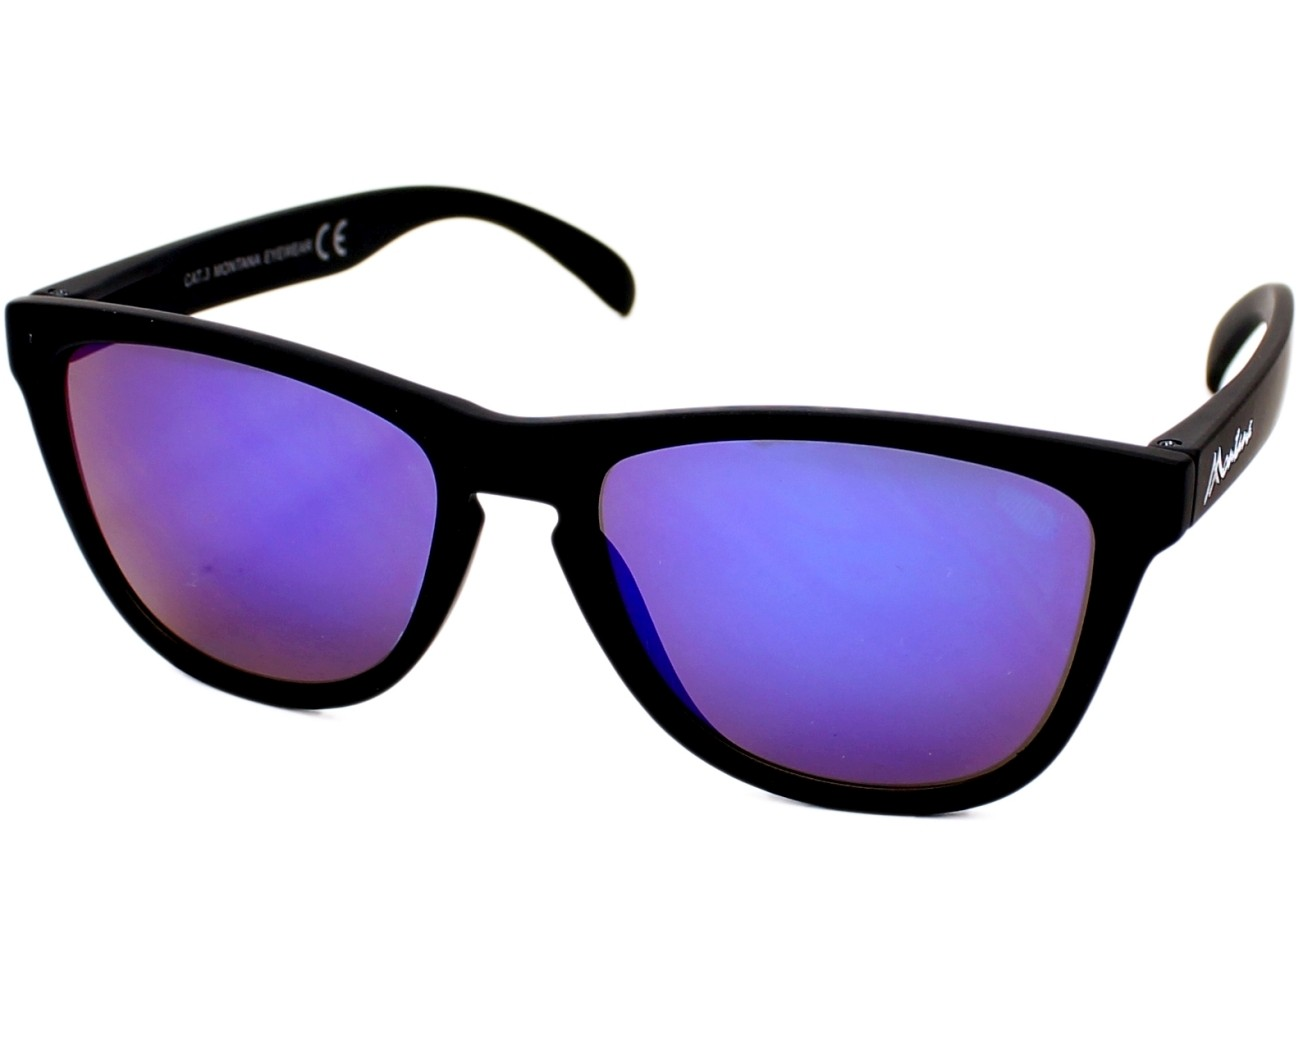 Montana Eyewear MS31-grau-matt agzfe1qnB